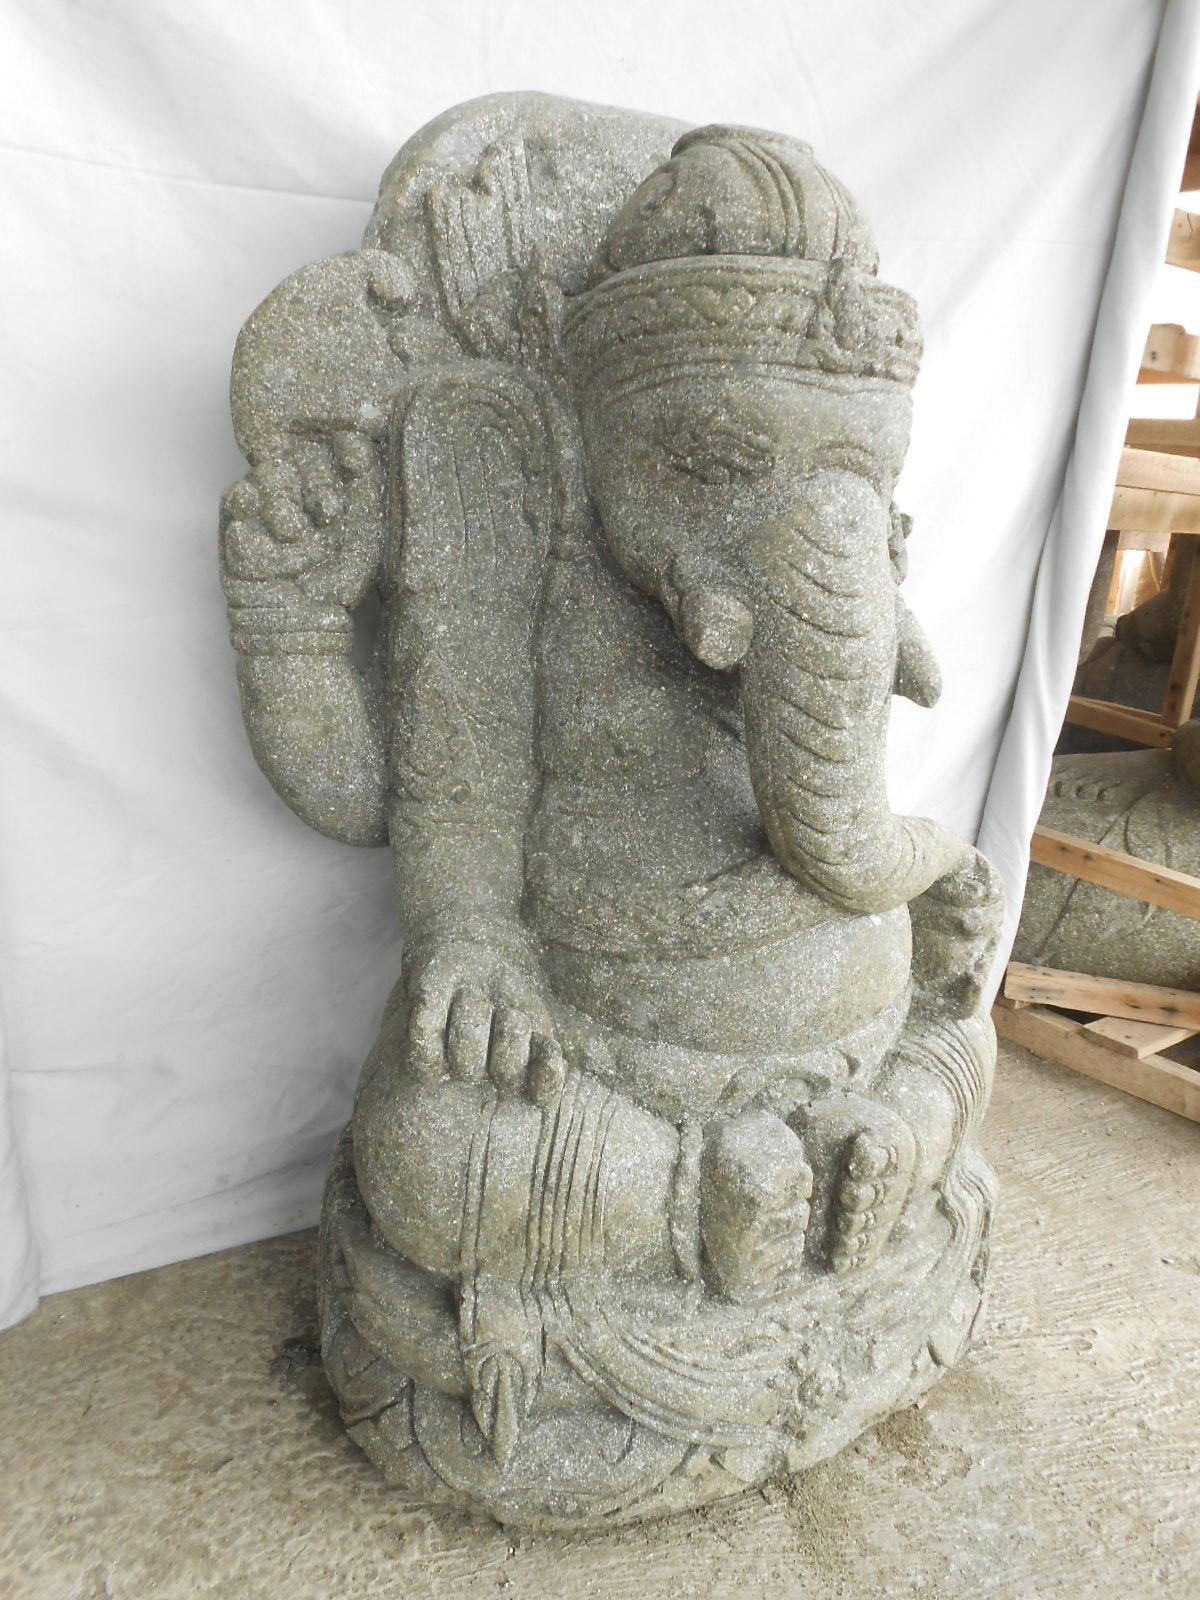 Statue de jardin ganesh en pierre de lave 80 cm - Statue jardin ...